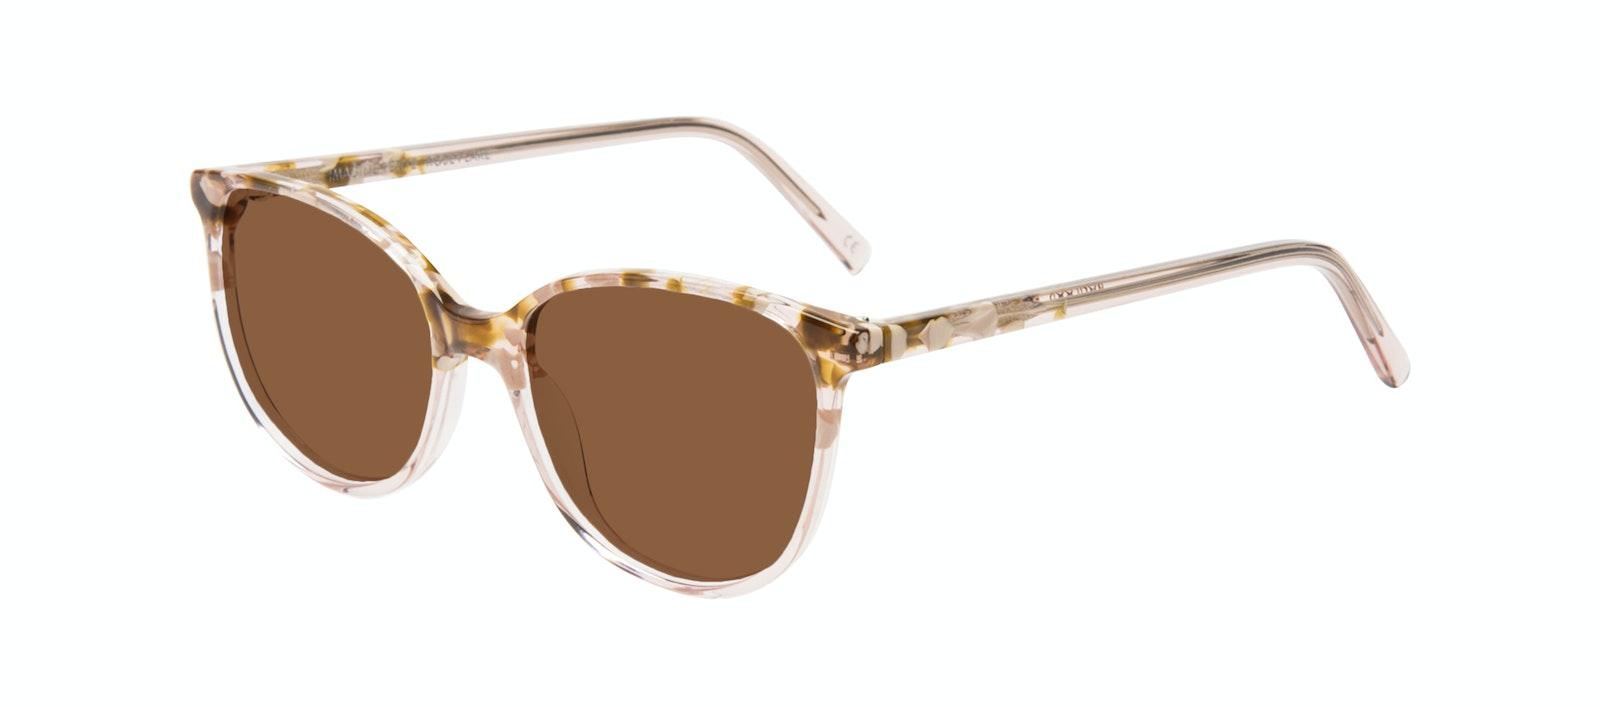 Affordable Fashion Glasses Round Sunglasses Women Imagine Petite Rose Flake Tilt